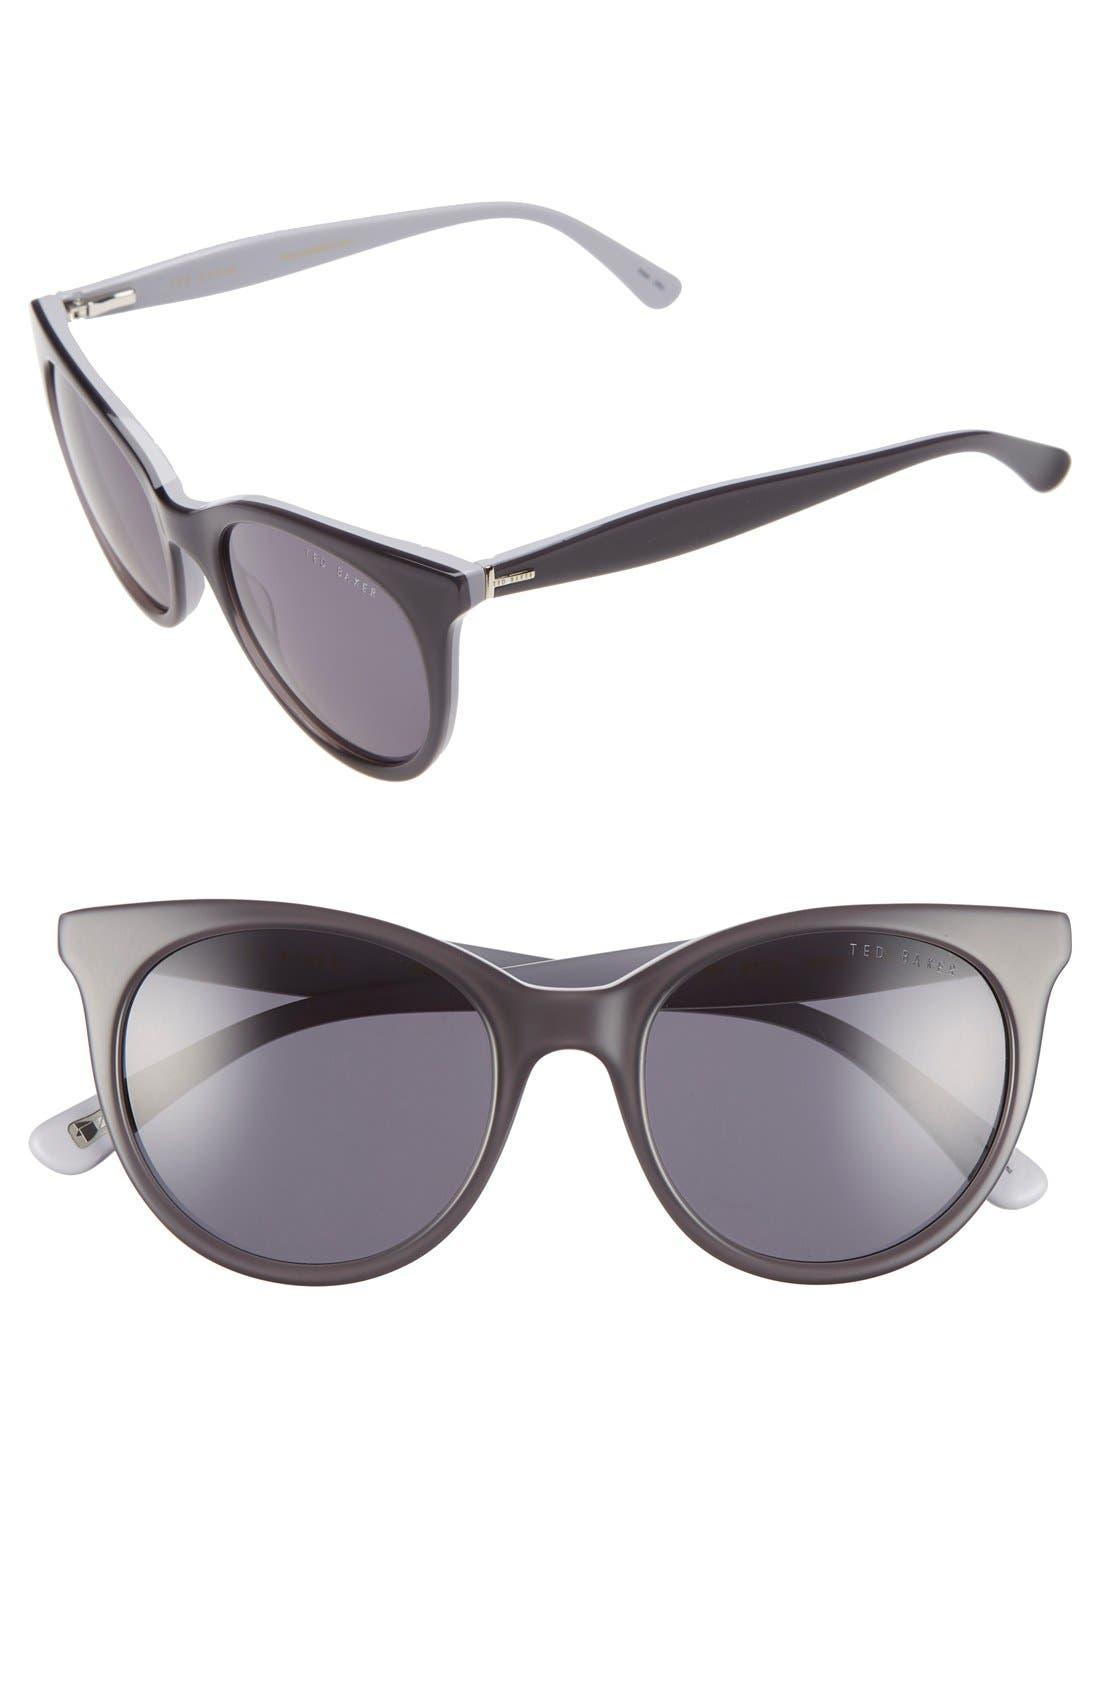 51mm Cat Eye Sunglasses,                             Main thumbnail 1, color,                             020